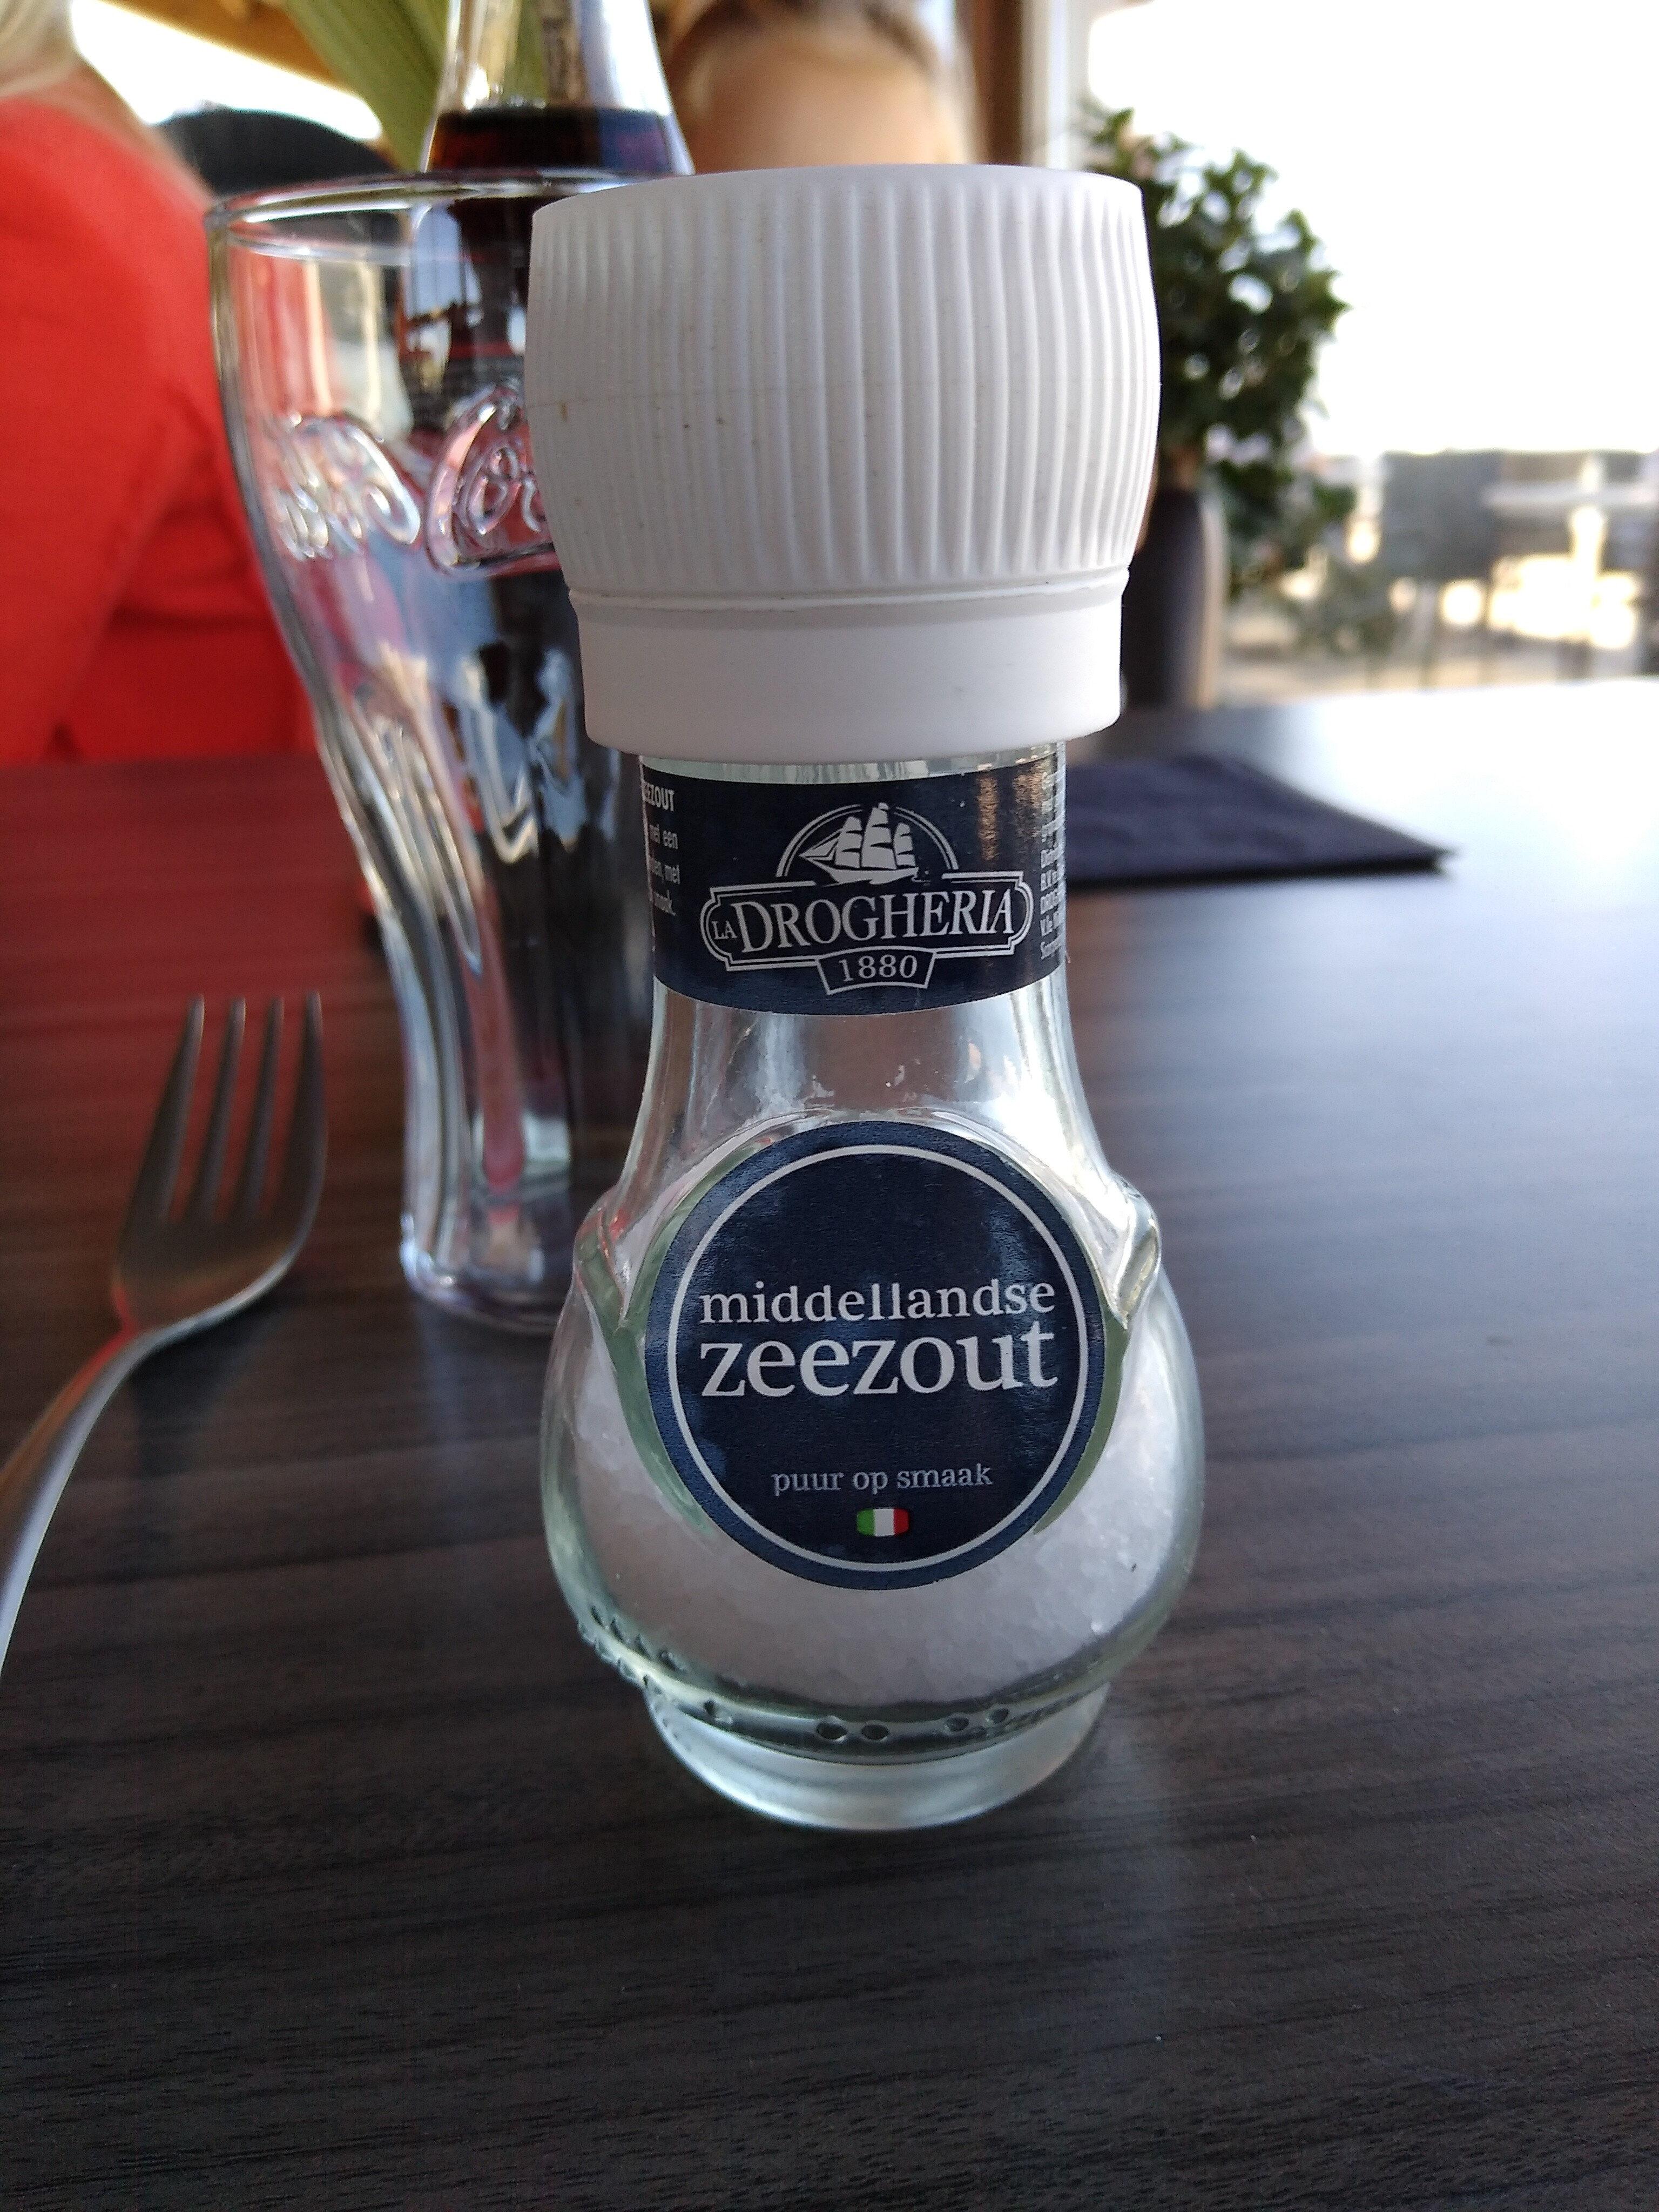 middellandse Zeezout - Product - nl